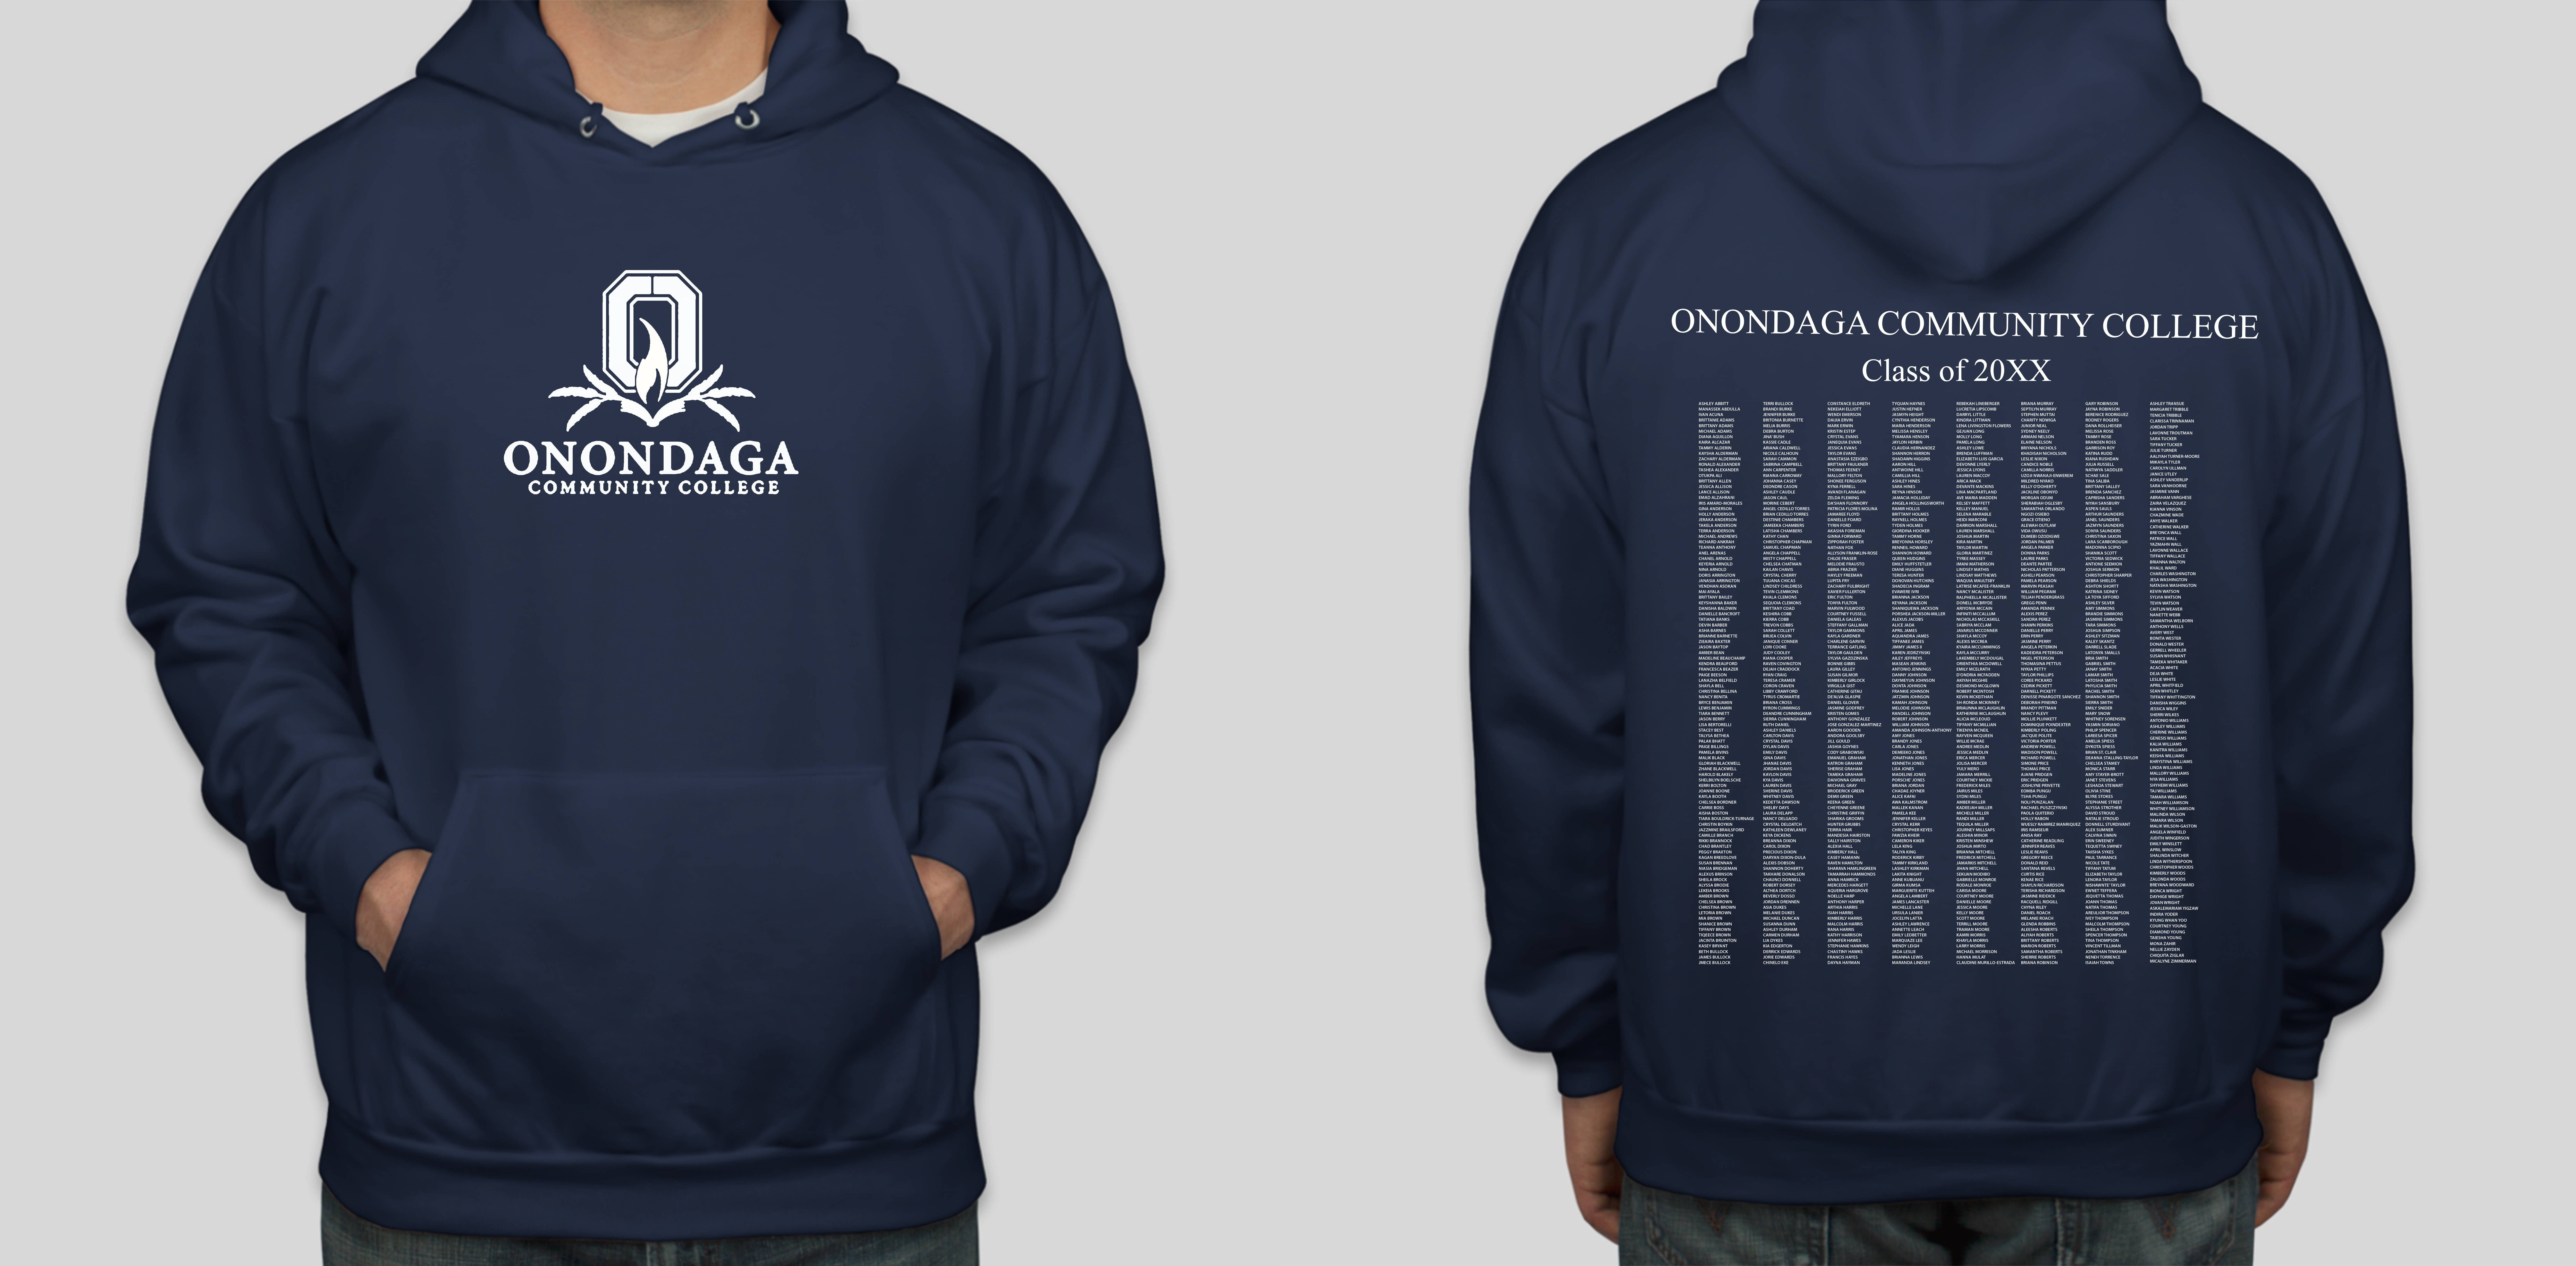 Onondaga Community College : Commencement Group